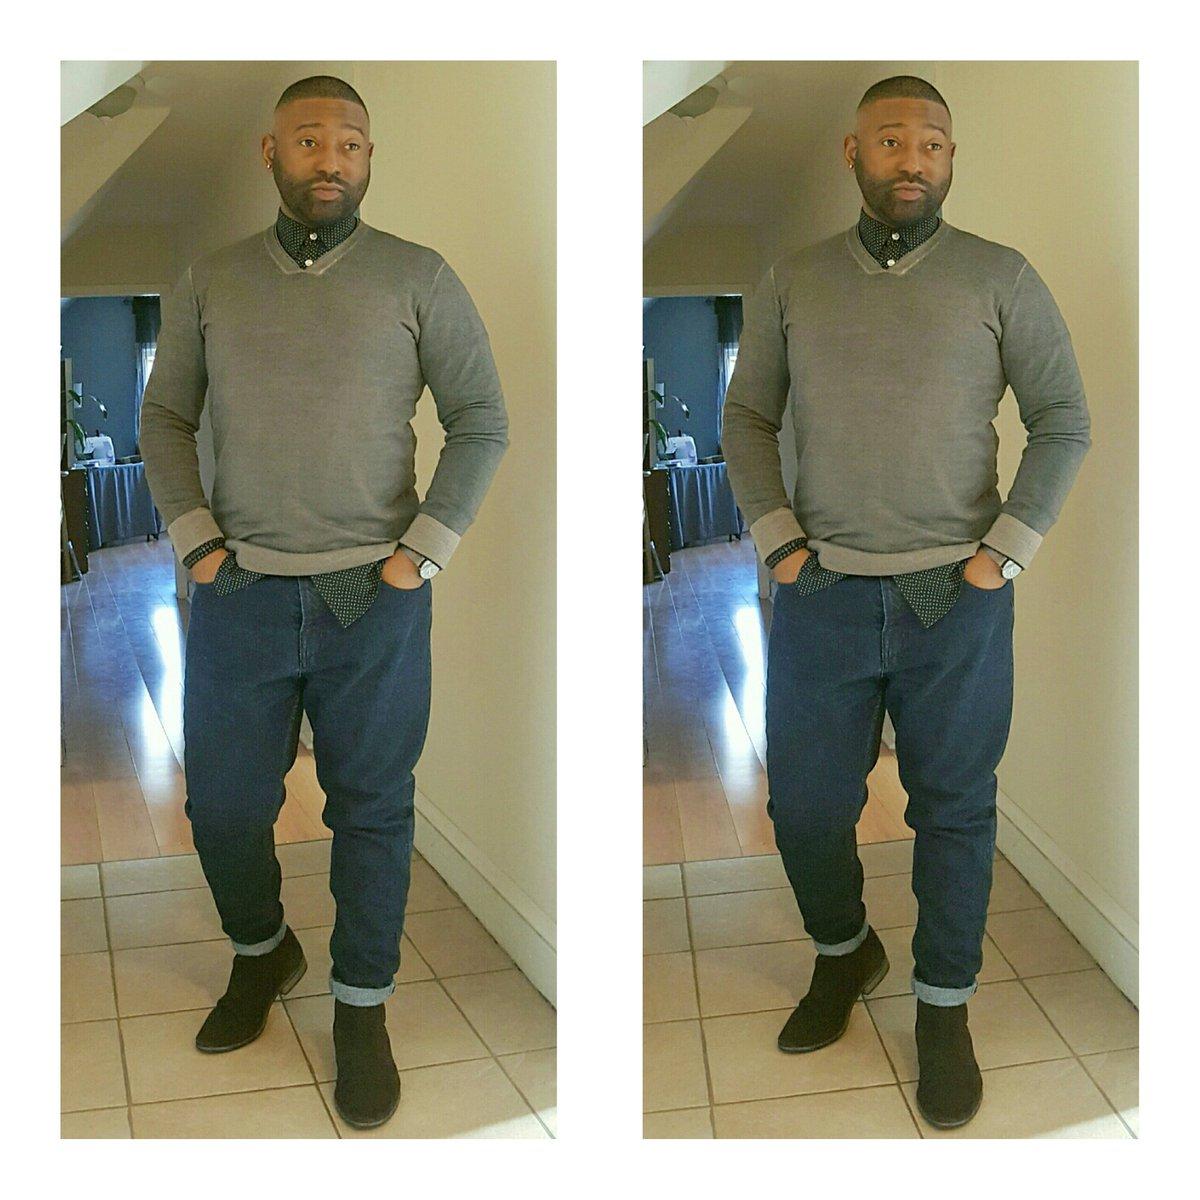 new day! #ootd #lookoftheday #happywednesday #humpday #hm #elietahari #topman #menswear #mensfashion #menwithstyle #stylishmen #beardlife<br>http://pic.twitter.com/LuFO2LgWgc